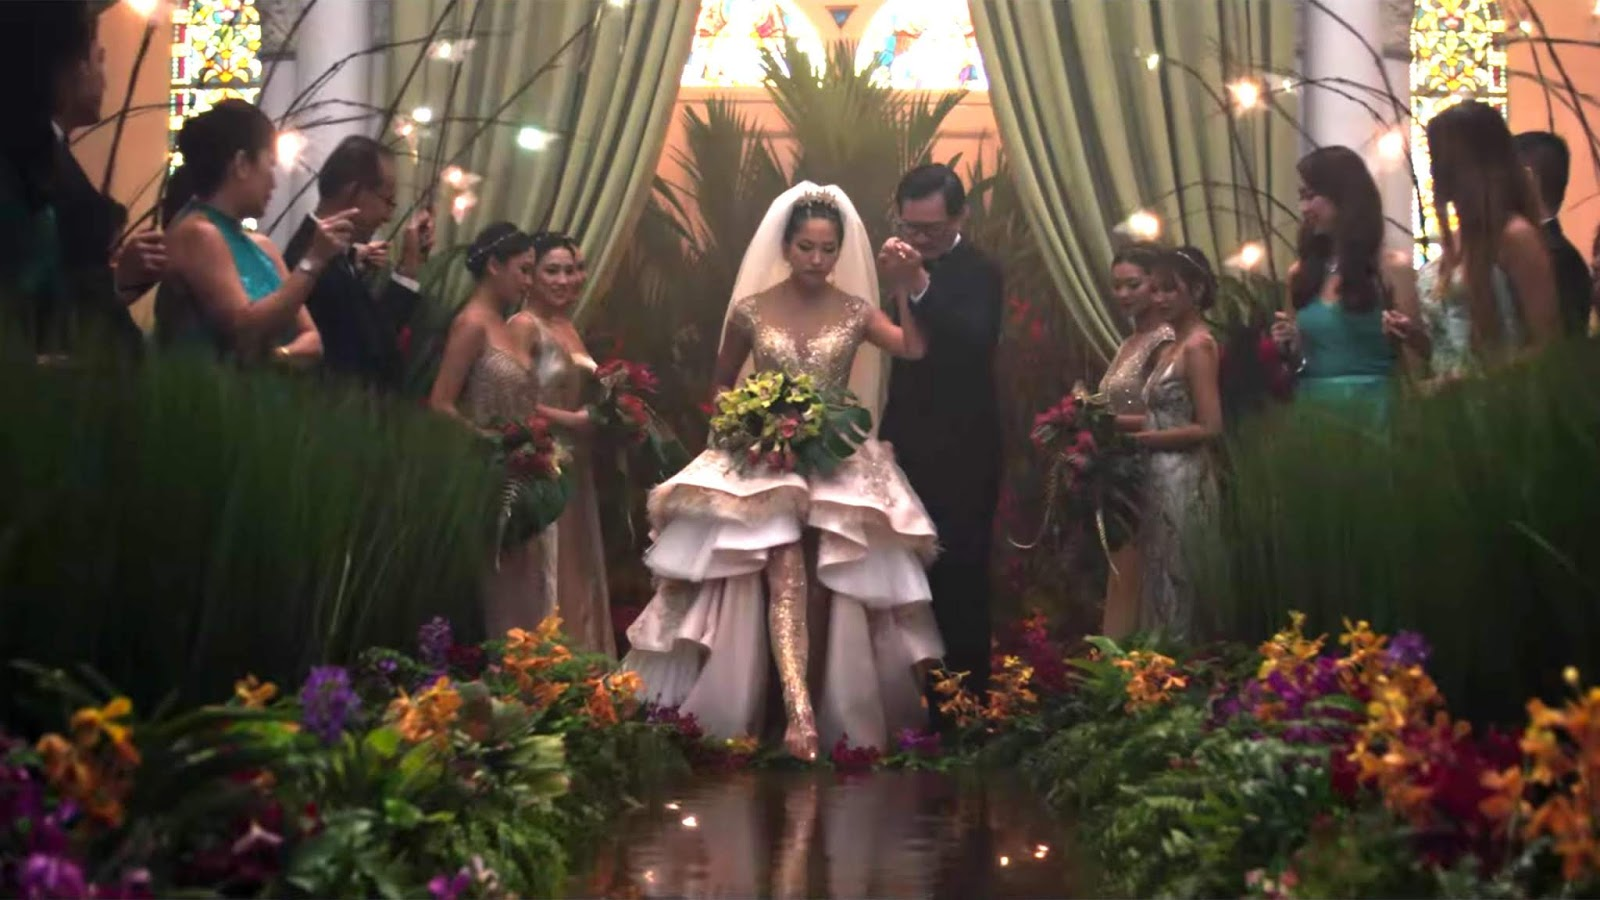 Colin Khoo (Chris Pang) and Araminta Lee (Sonoya Mizuno) wedding in Crazy Rich Asians